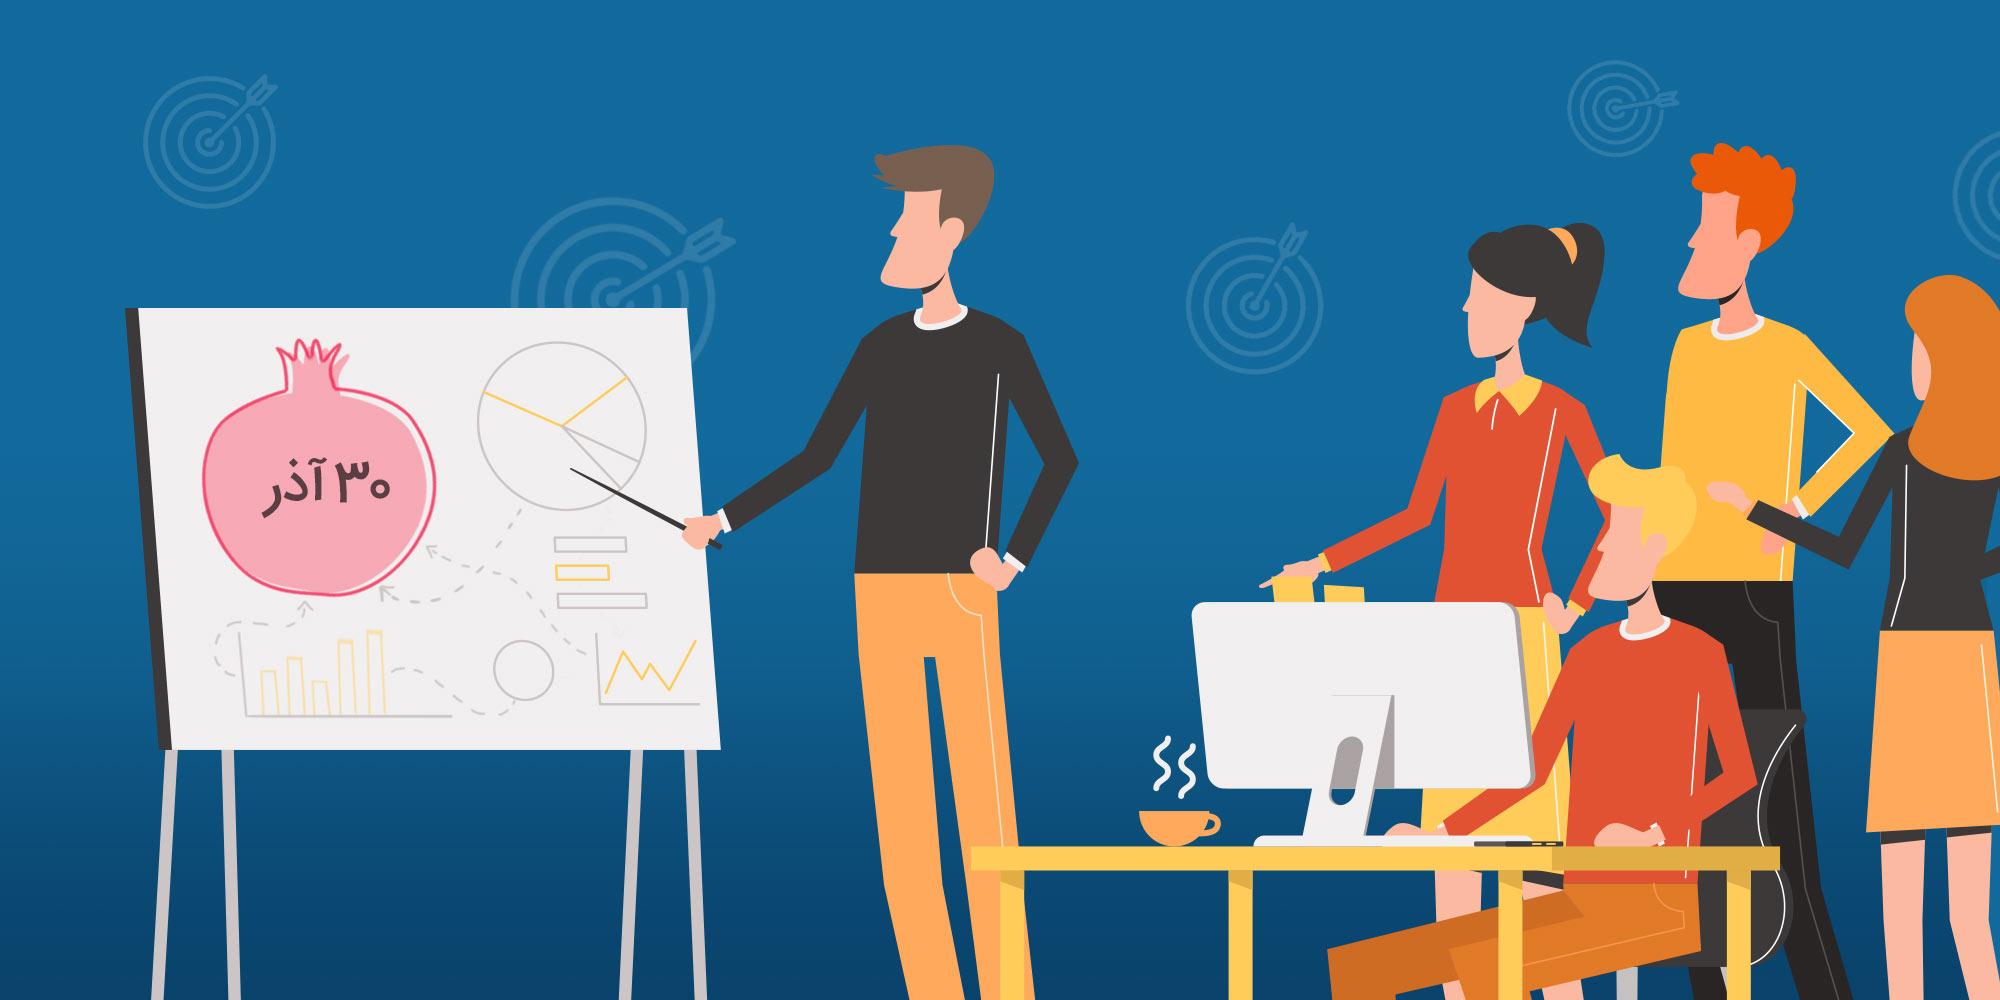 تعیین اهداف کمپین تبلیغاتی یلدا